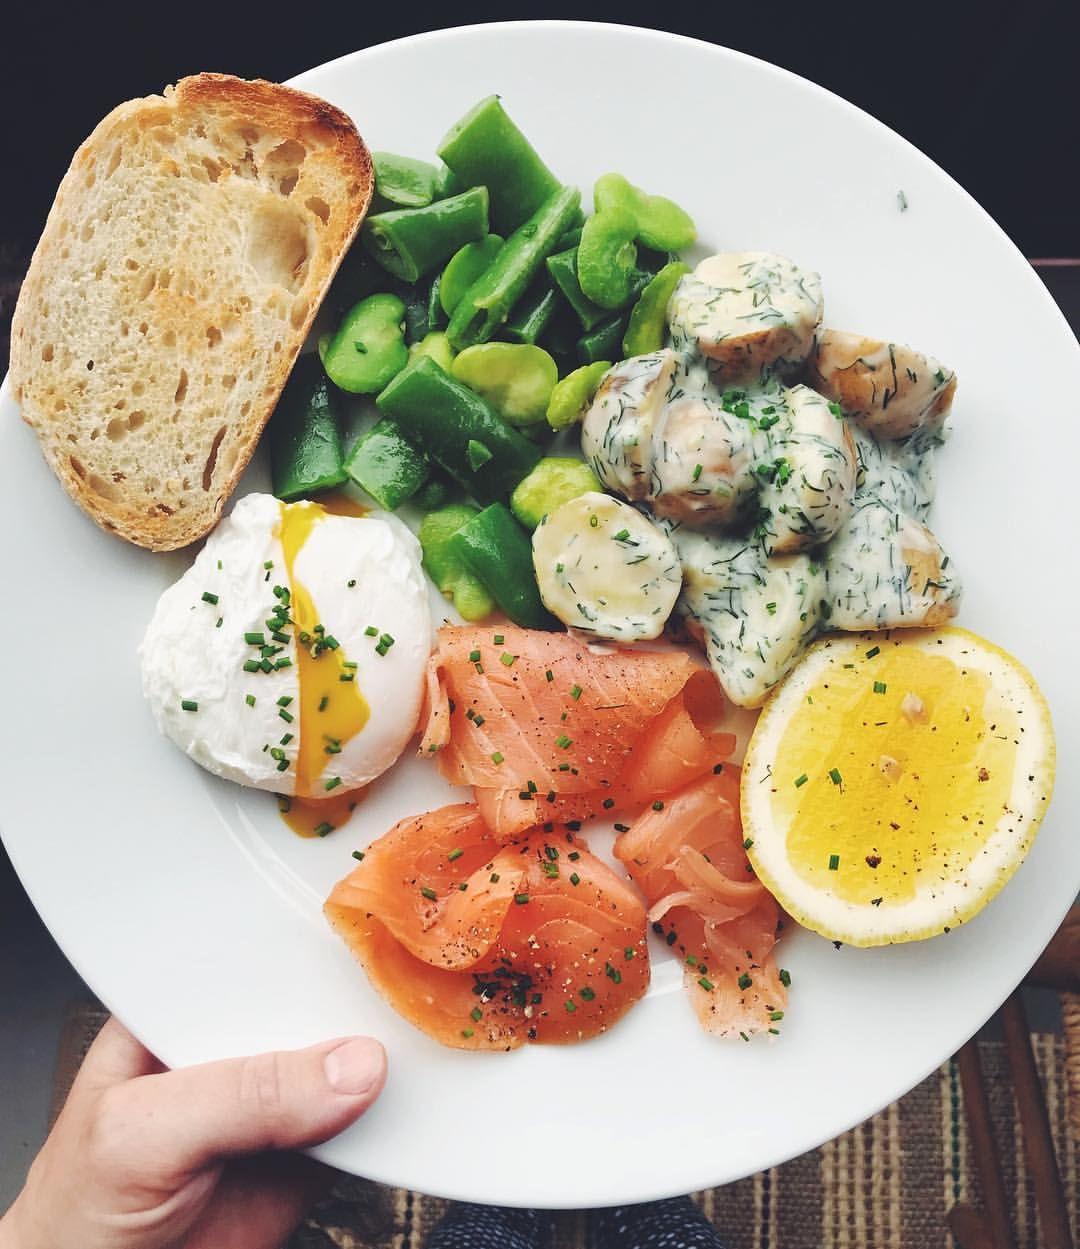 Домашняя диета рецепты